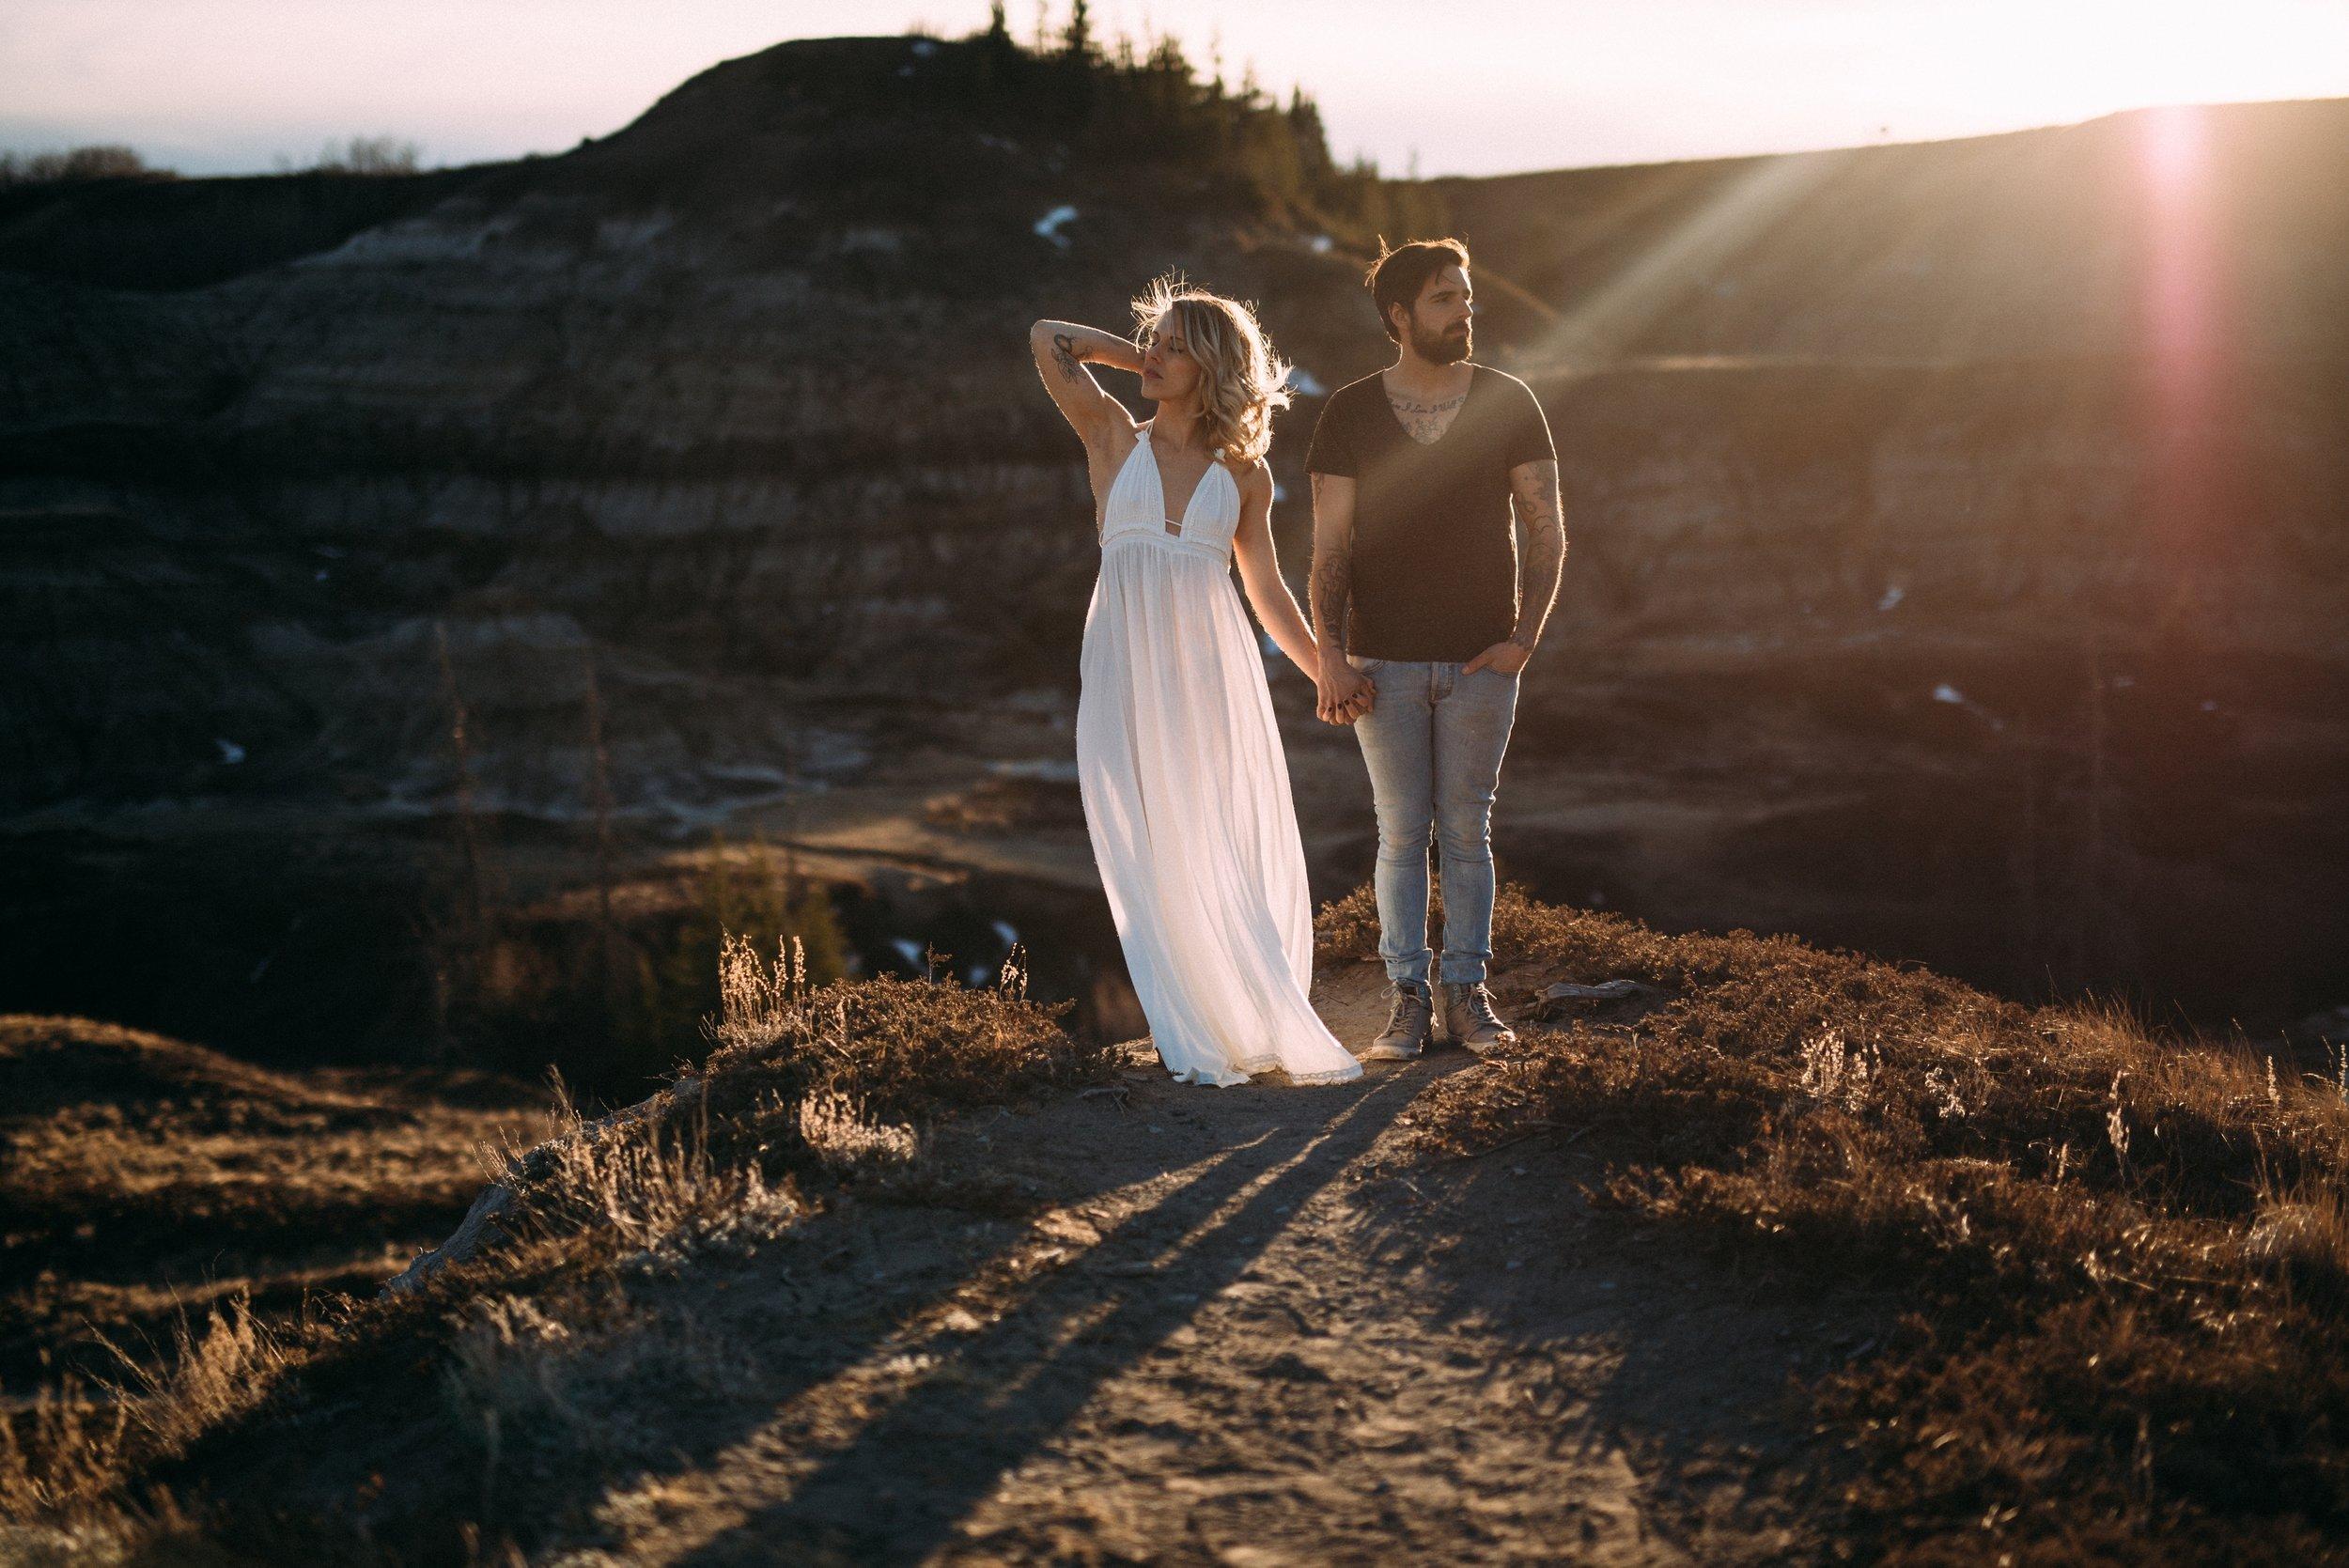 kaihla_tonai_intimate_wedding_elopement_photographer_3596